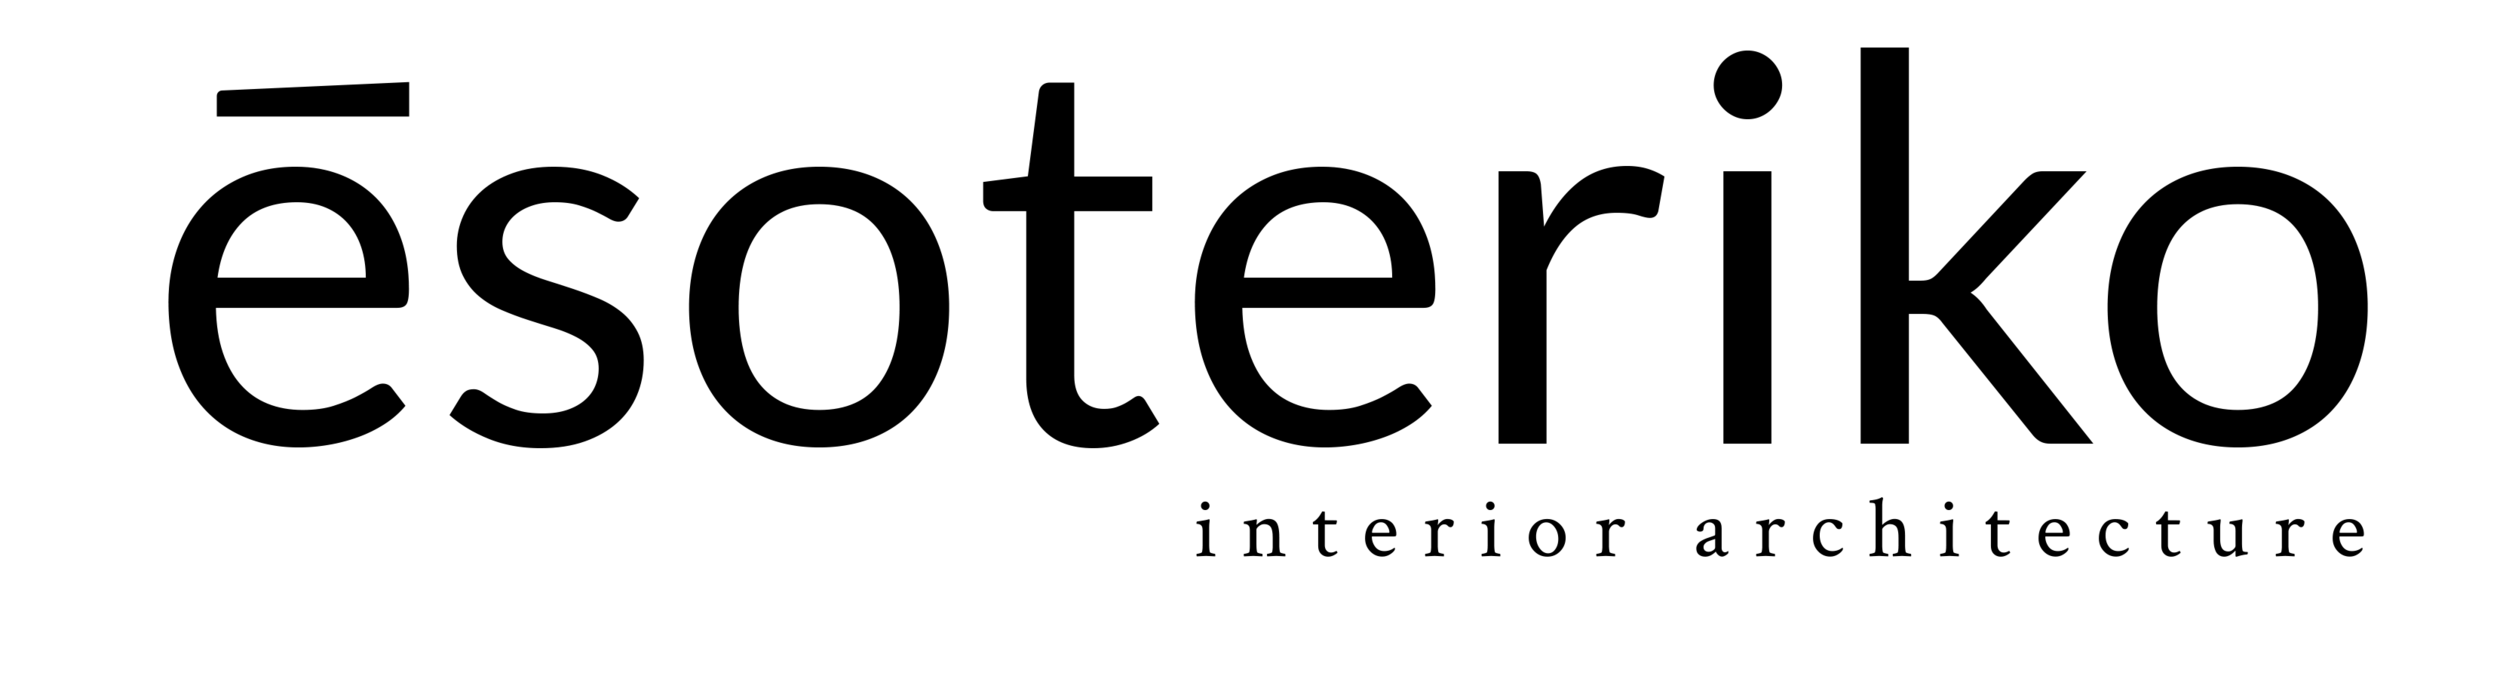 esoteriko logo black (hi res).png